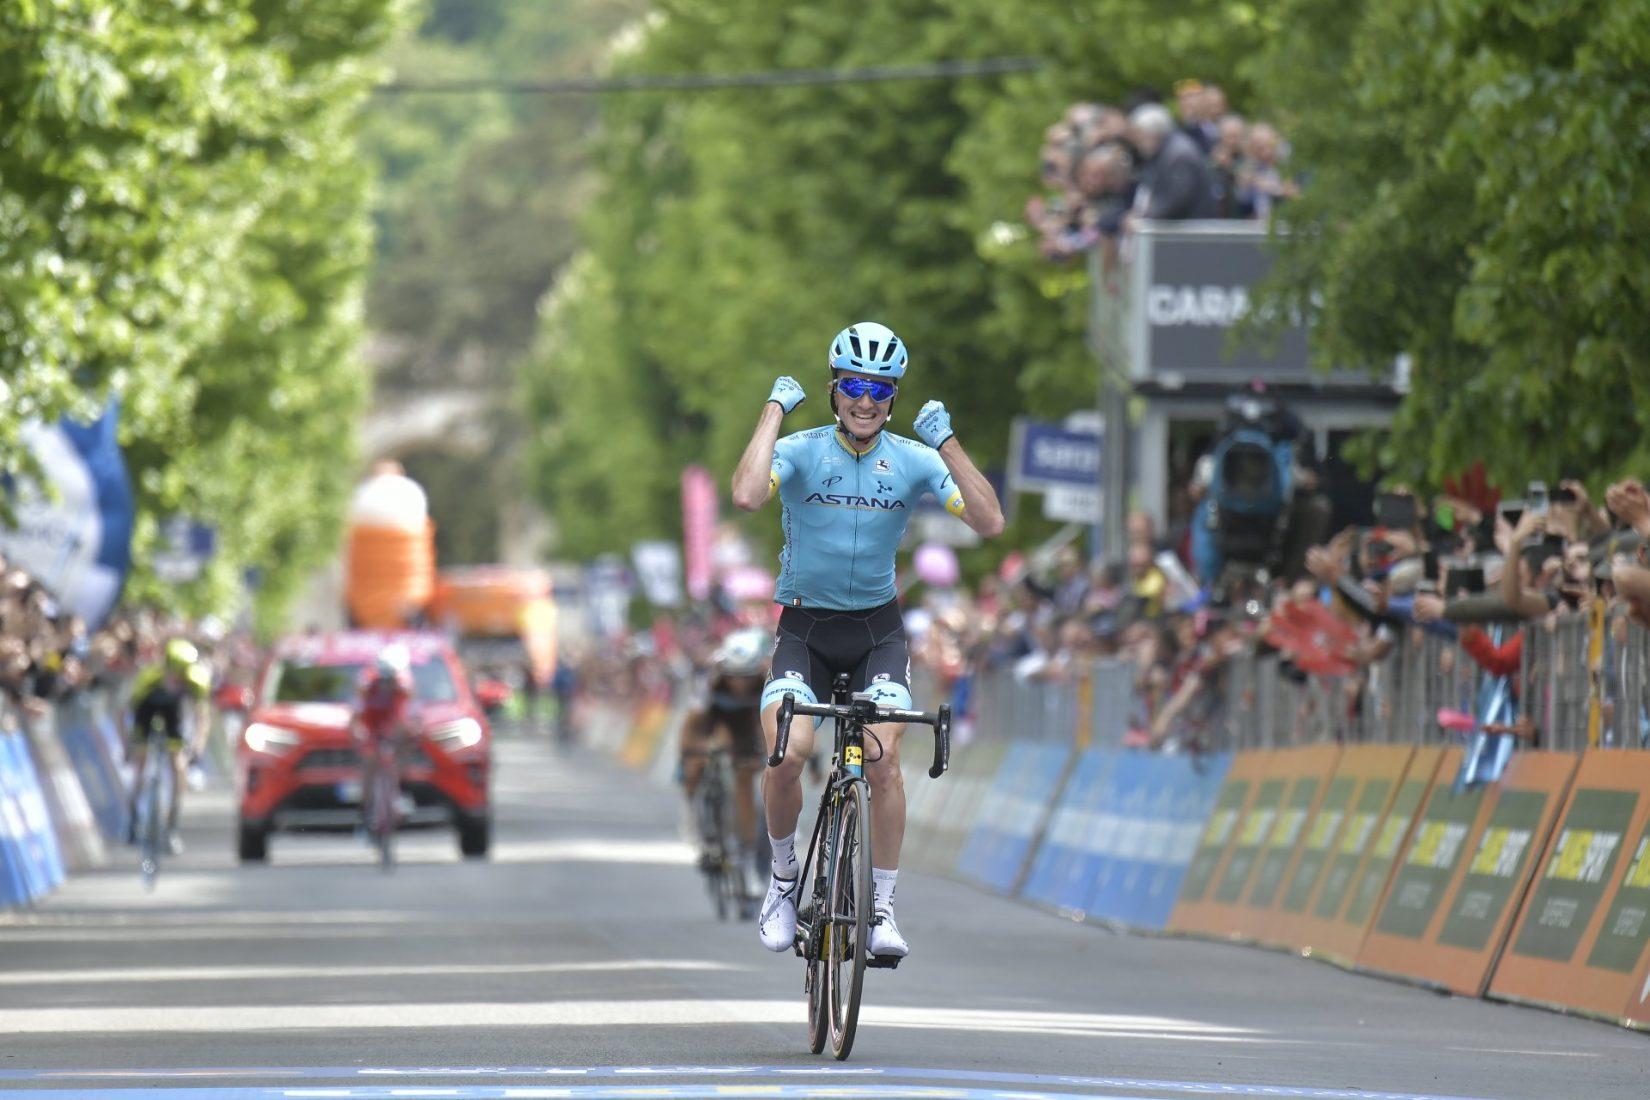 Giro 2019: Pello Bilbao in solitaria